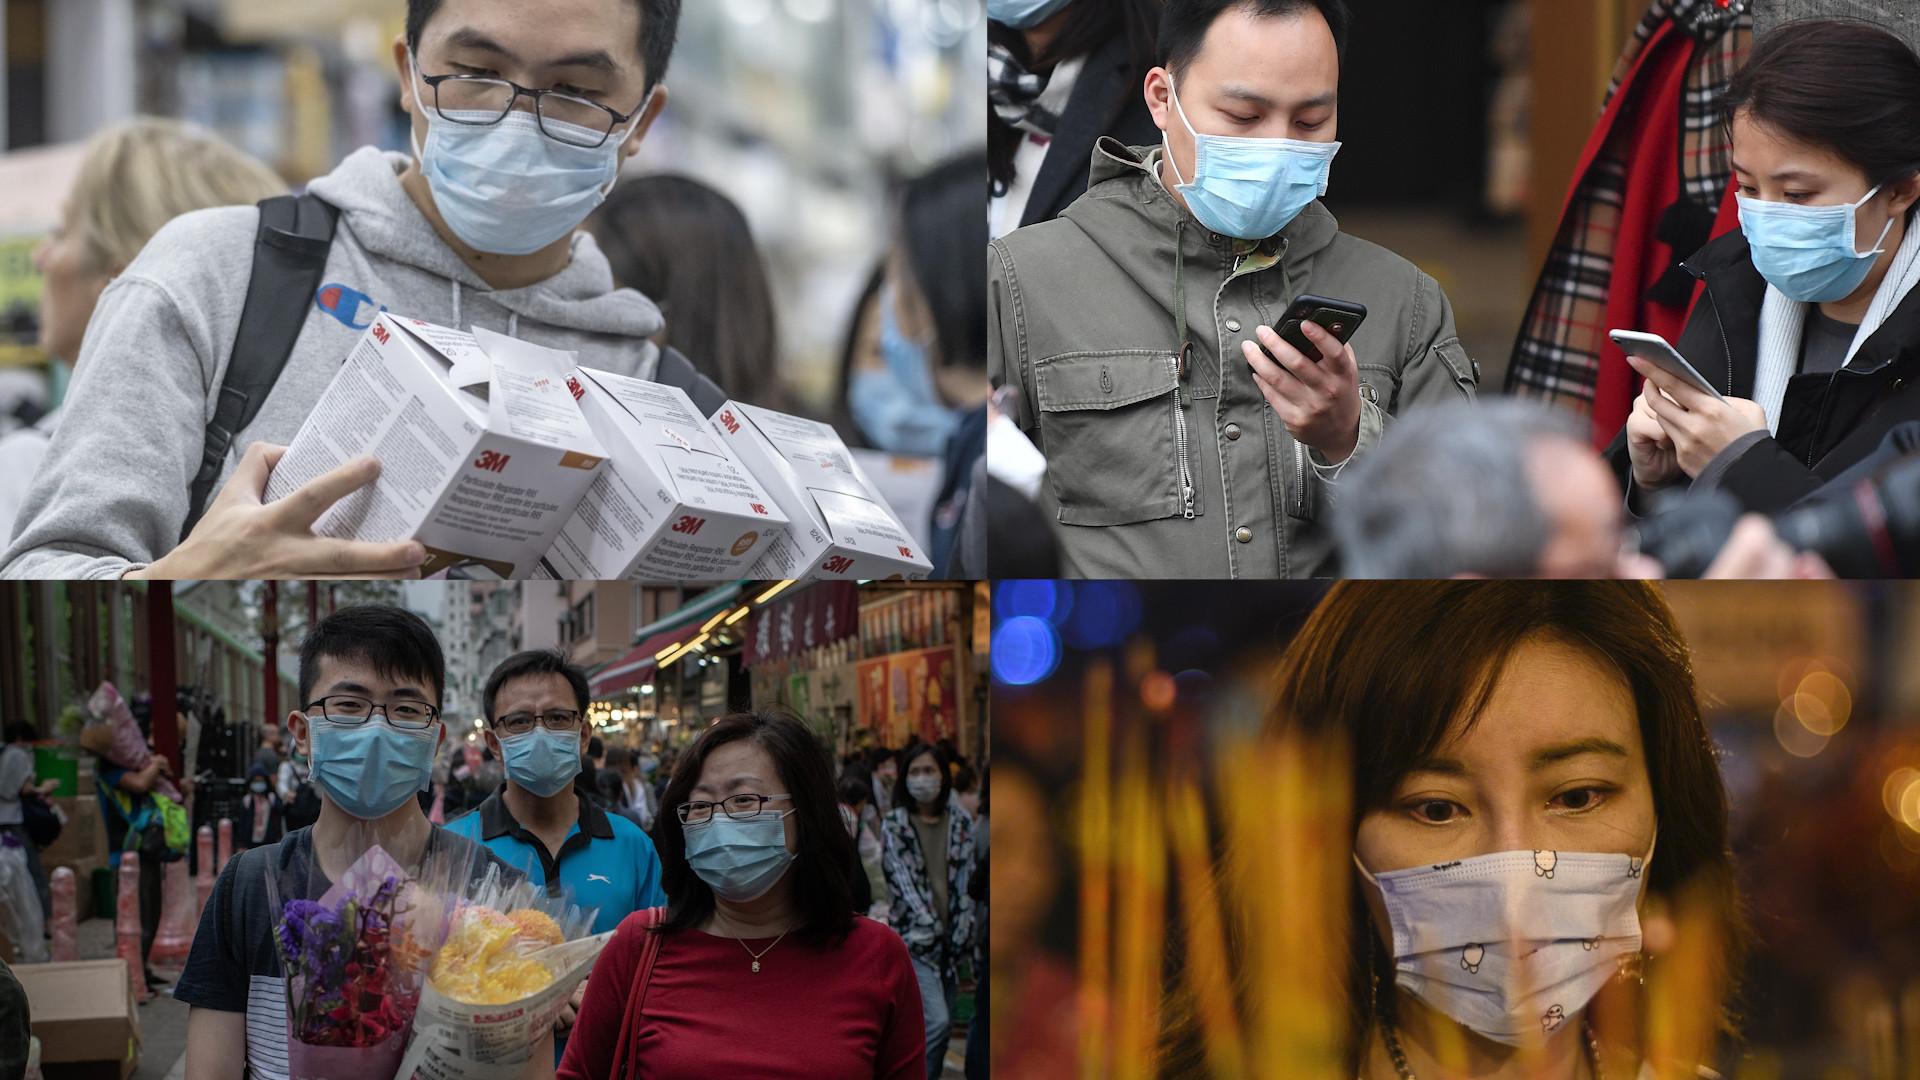 de unde cumparam masca fata virus